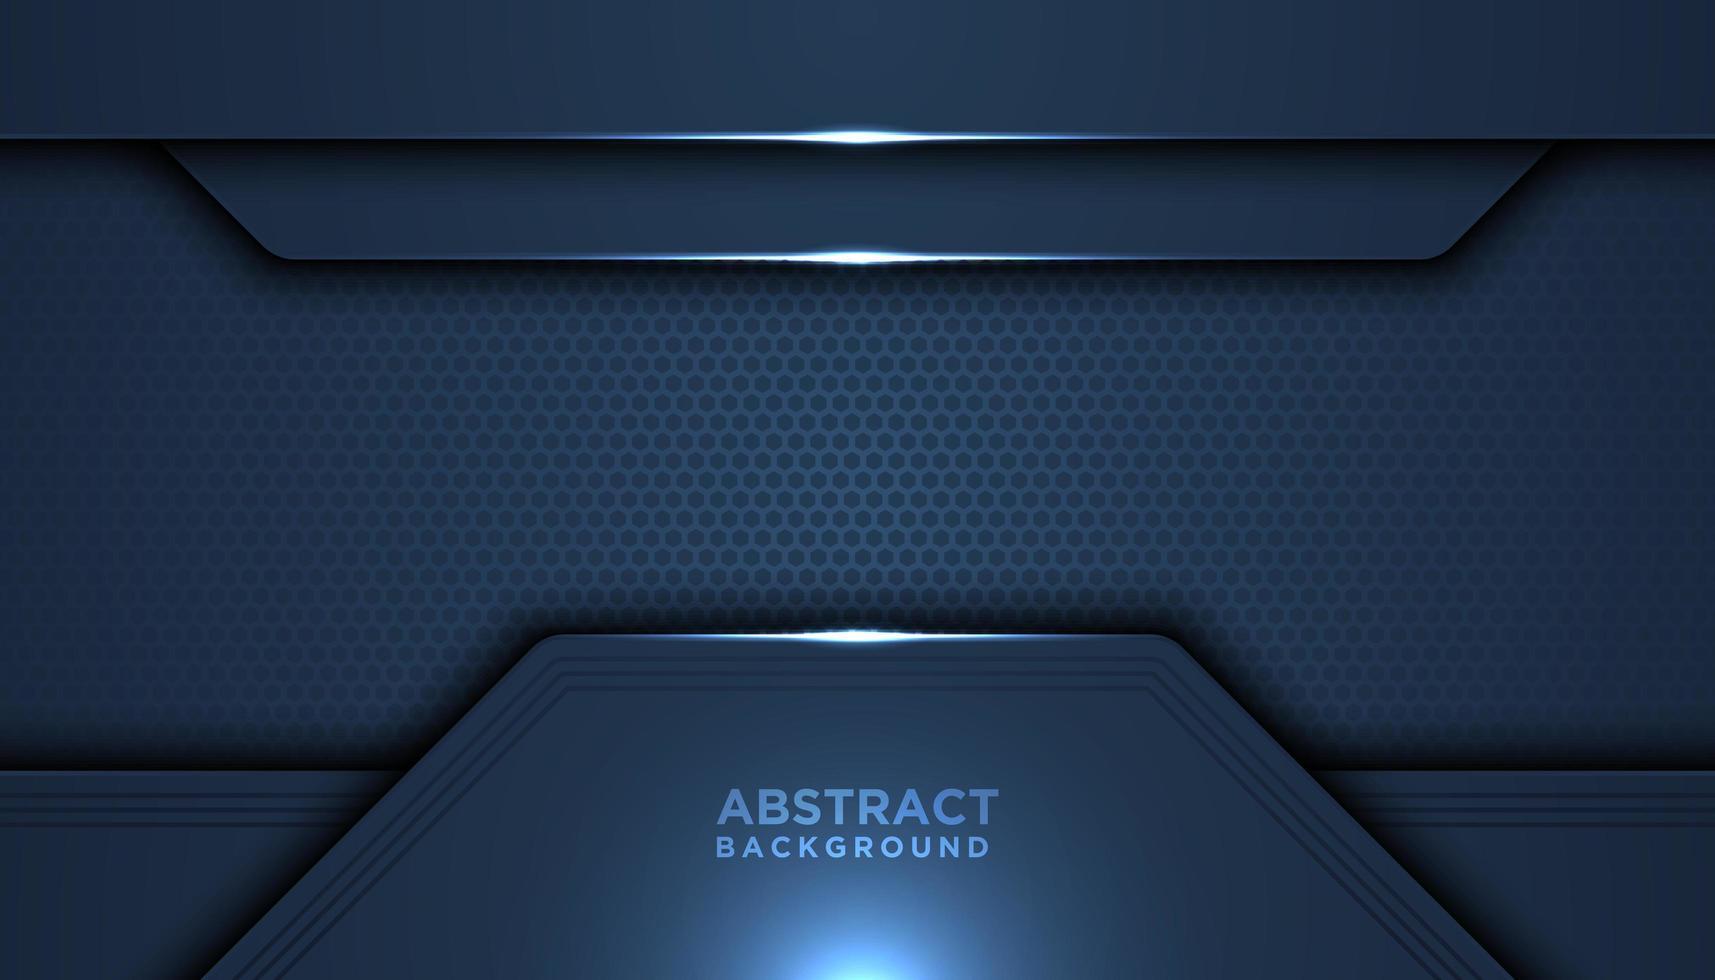 capas superpuestas de tecnología de malla azul oscuro vector